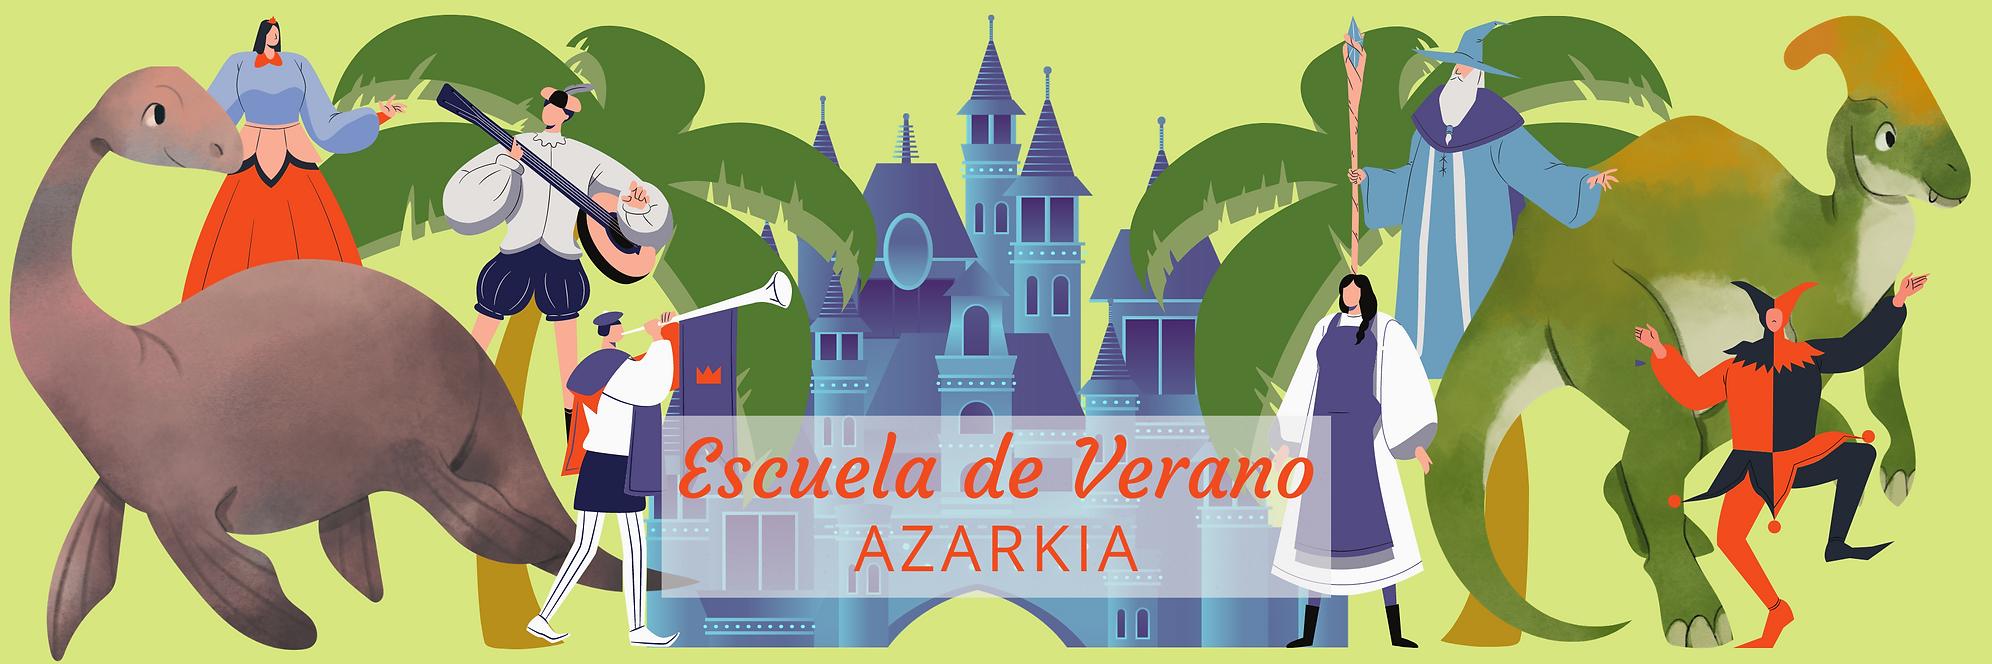 Escuela de verano Azarkia 2021 - Banner.